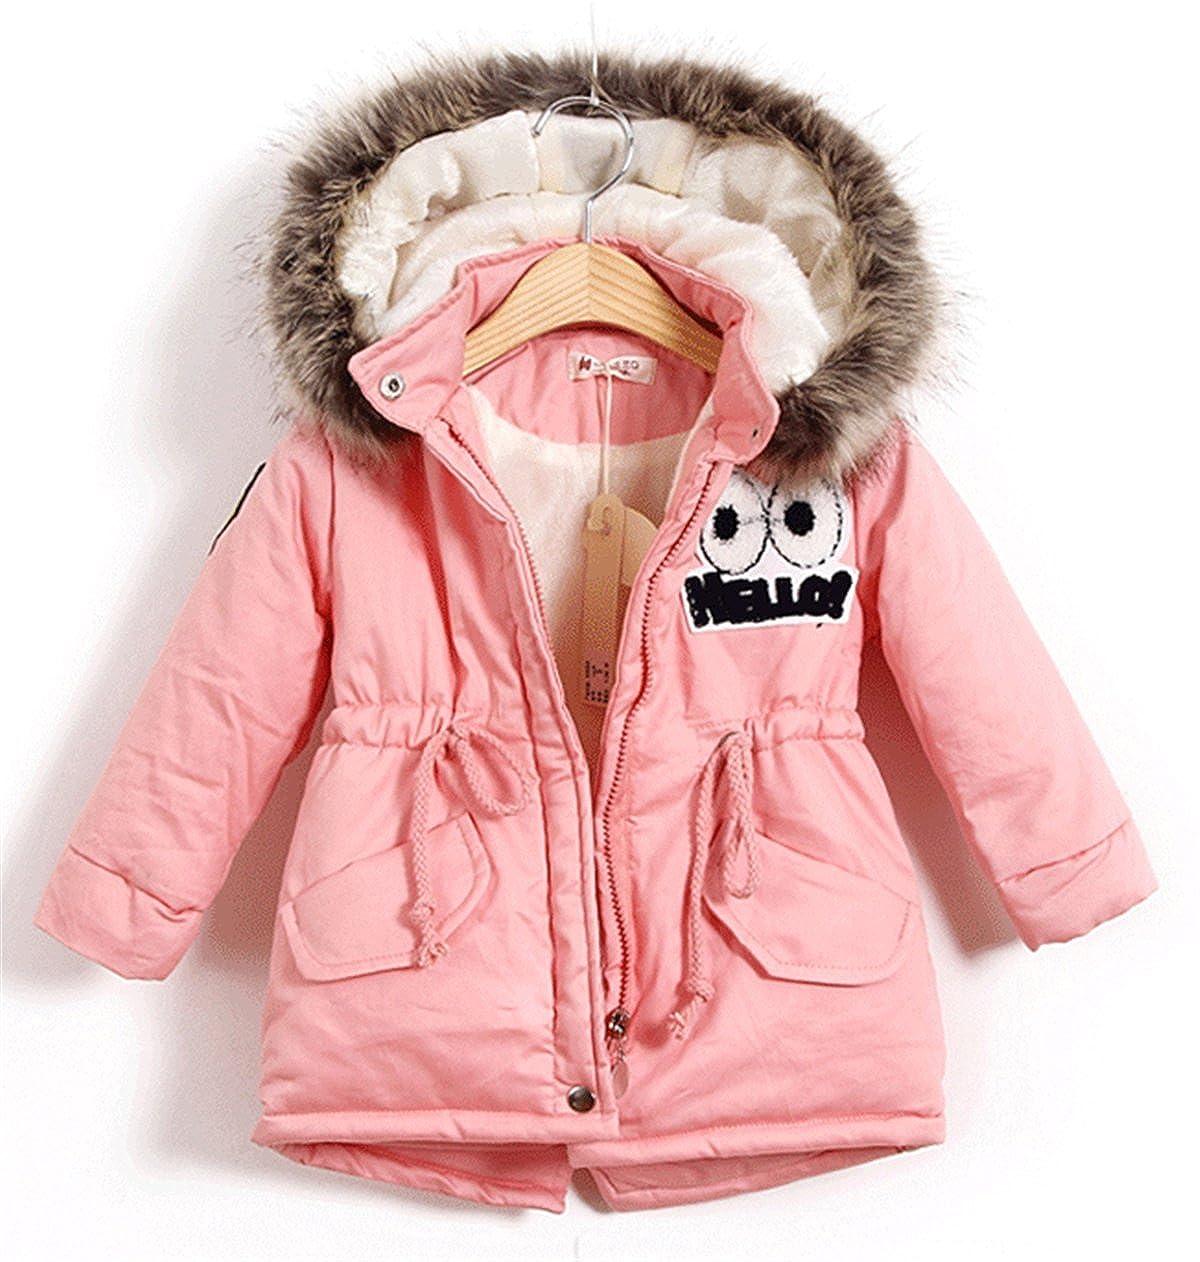 BBSMYA Baby Mädchen Jacke Mäntel Kleinkind Mädchen Winterjacke Kinderjacken Fell Warm Winter Coat Mantel Jacke Dicke Warme 0-3 Jahre